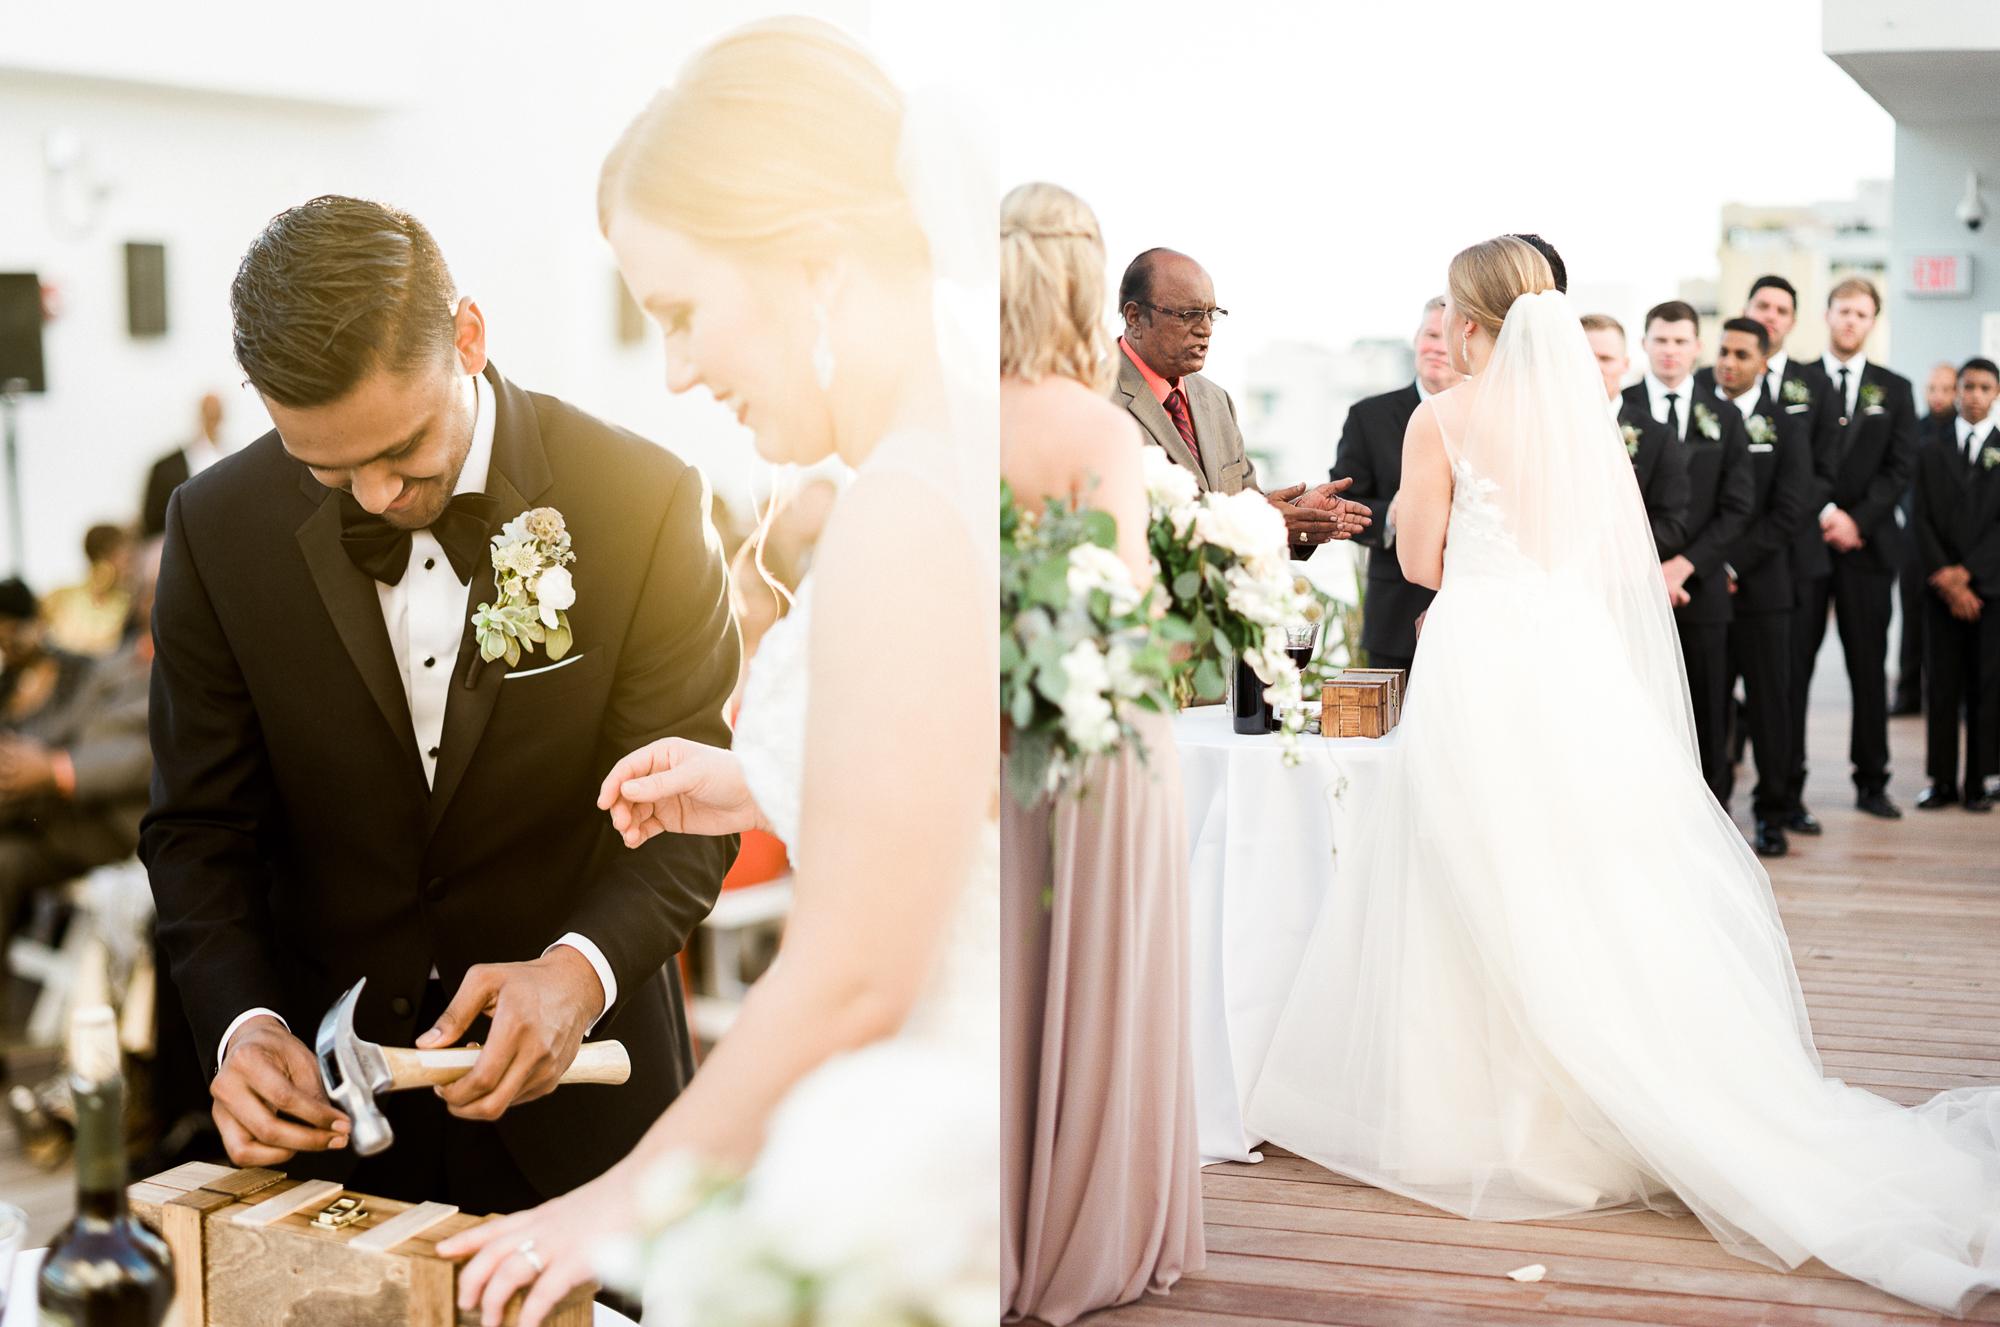 betsy-hotel-wedding-south-beach-miami-charleston-south-carolina-destination-wedding-photographer-22.jpg